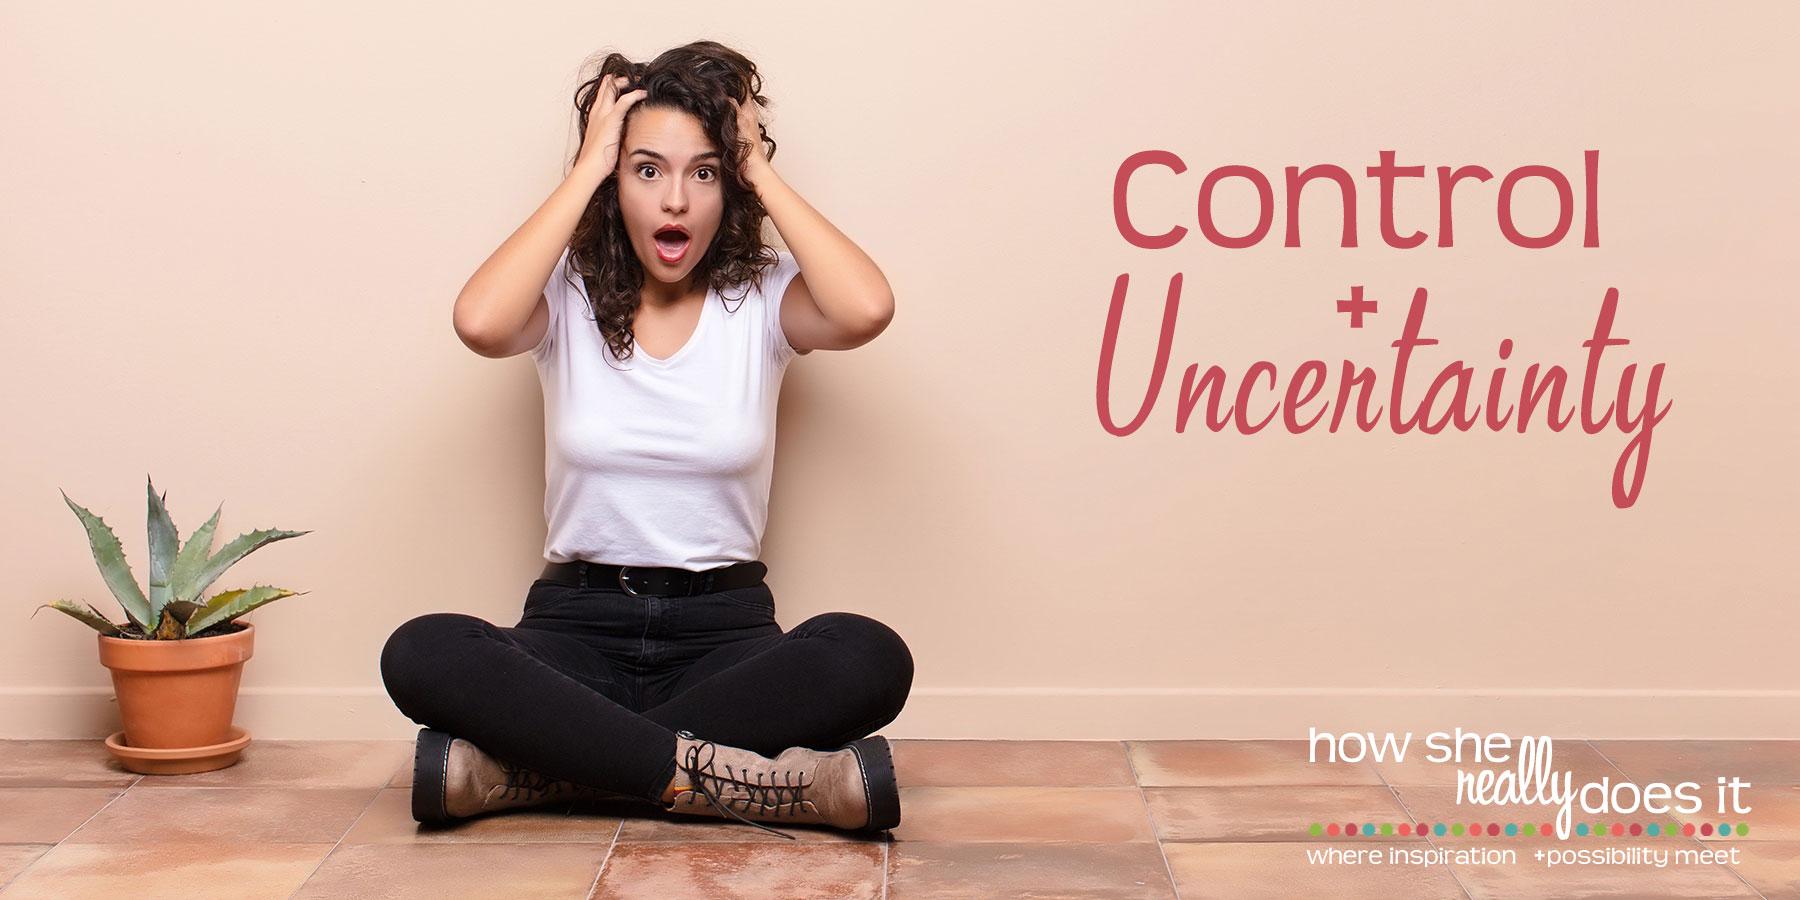 Control + Uncertainty